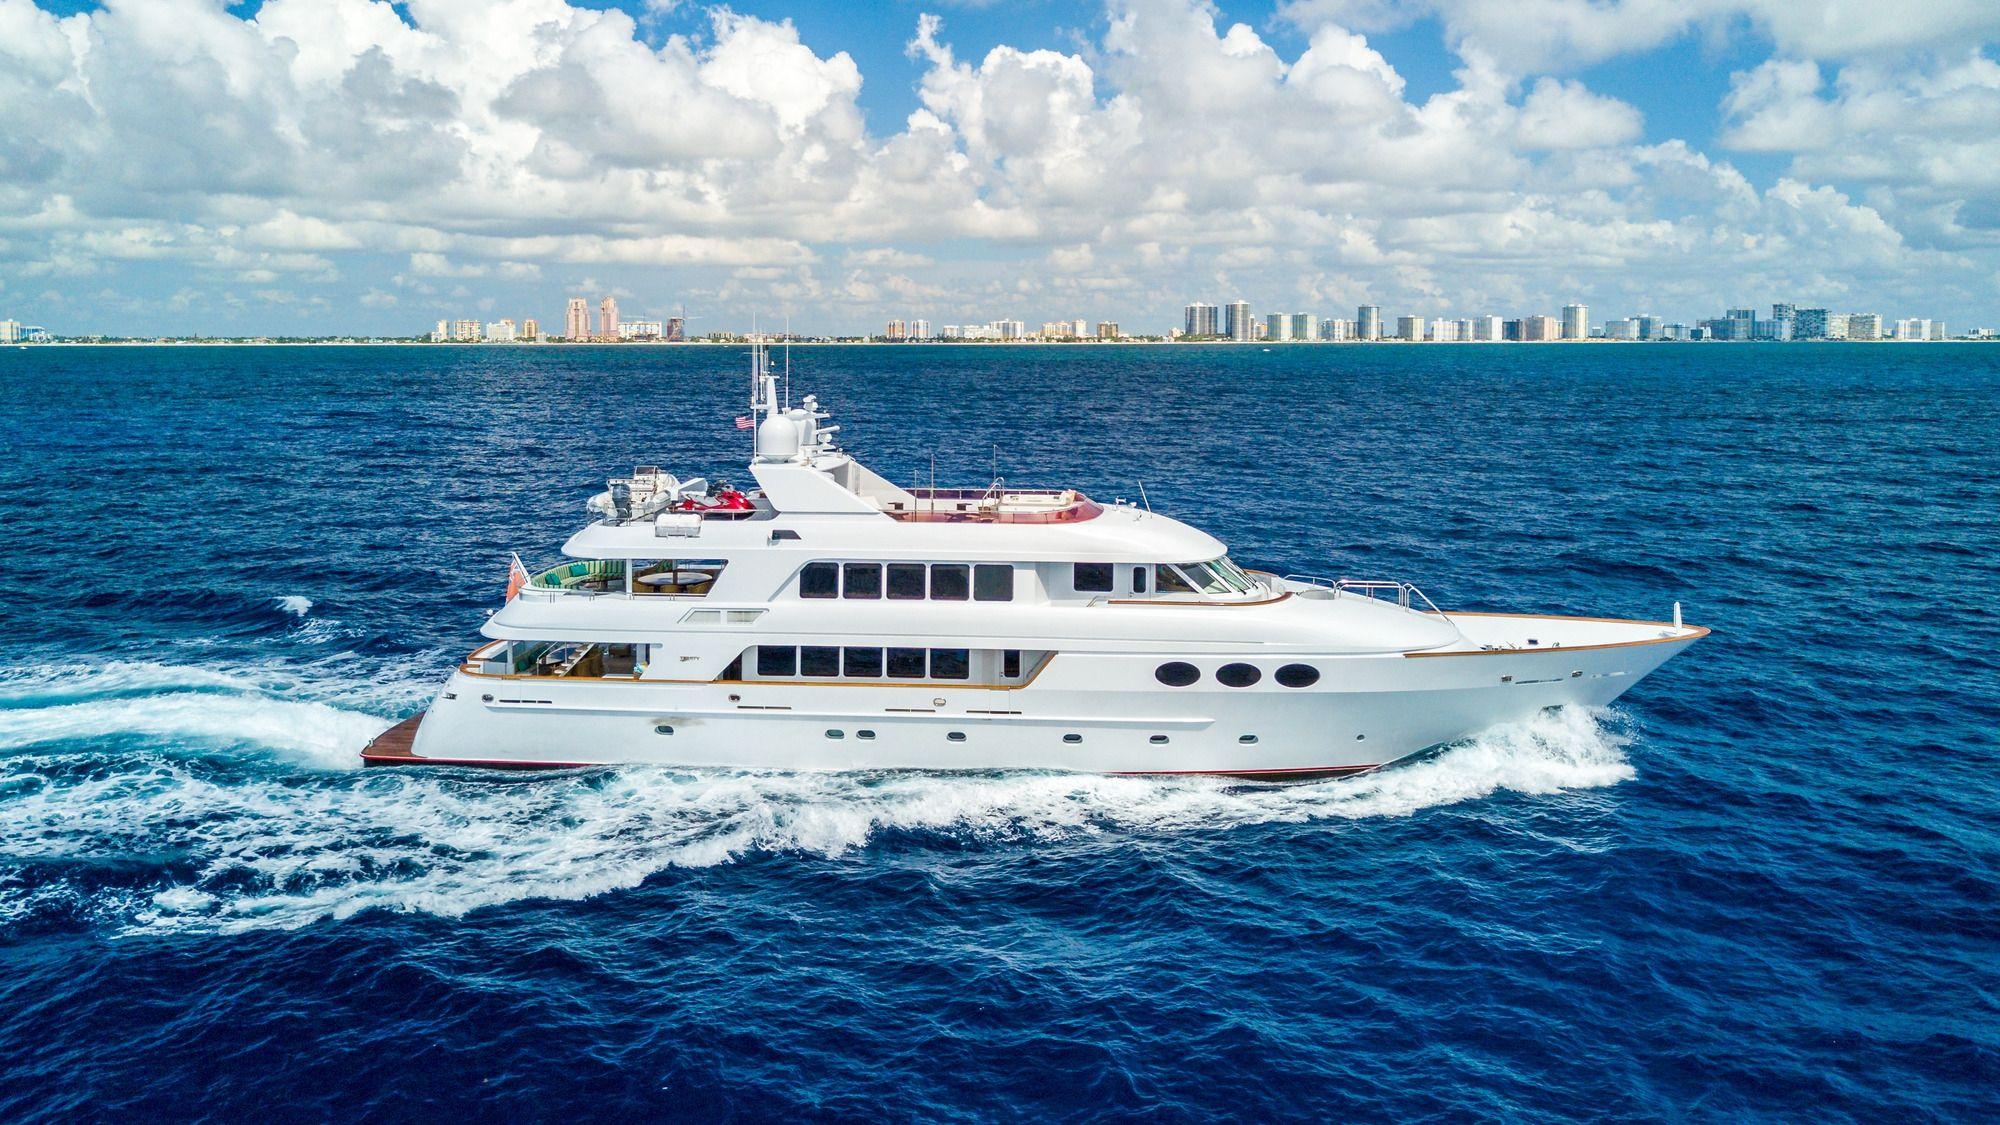 RELENTLESS Trinity 145 Luxury Superyacht Running